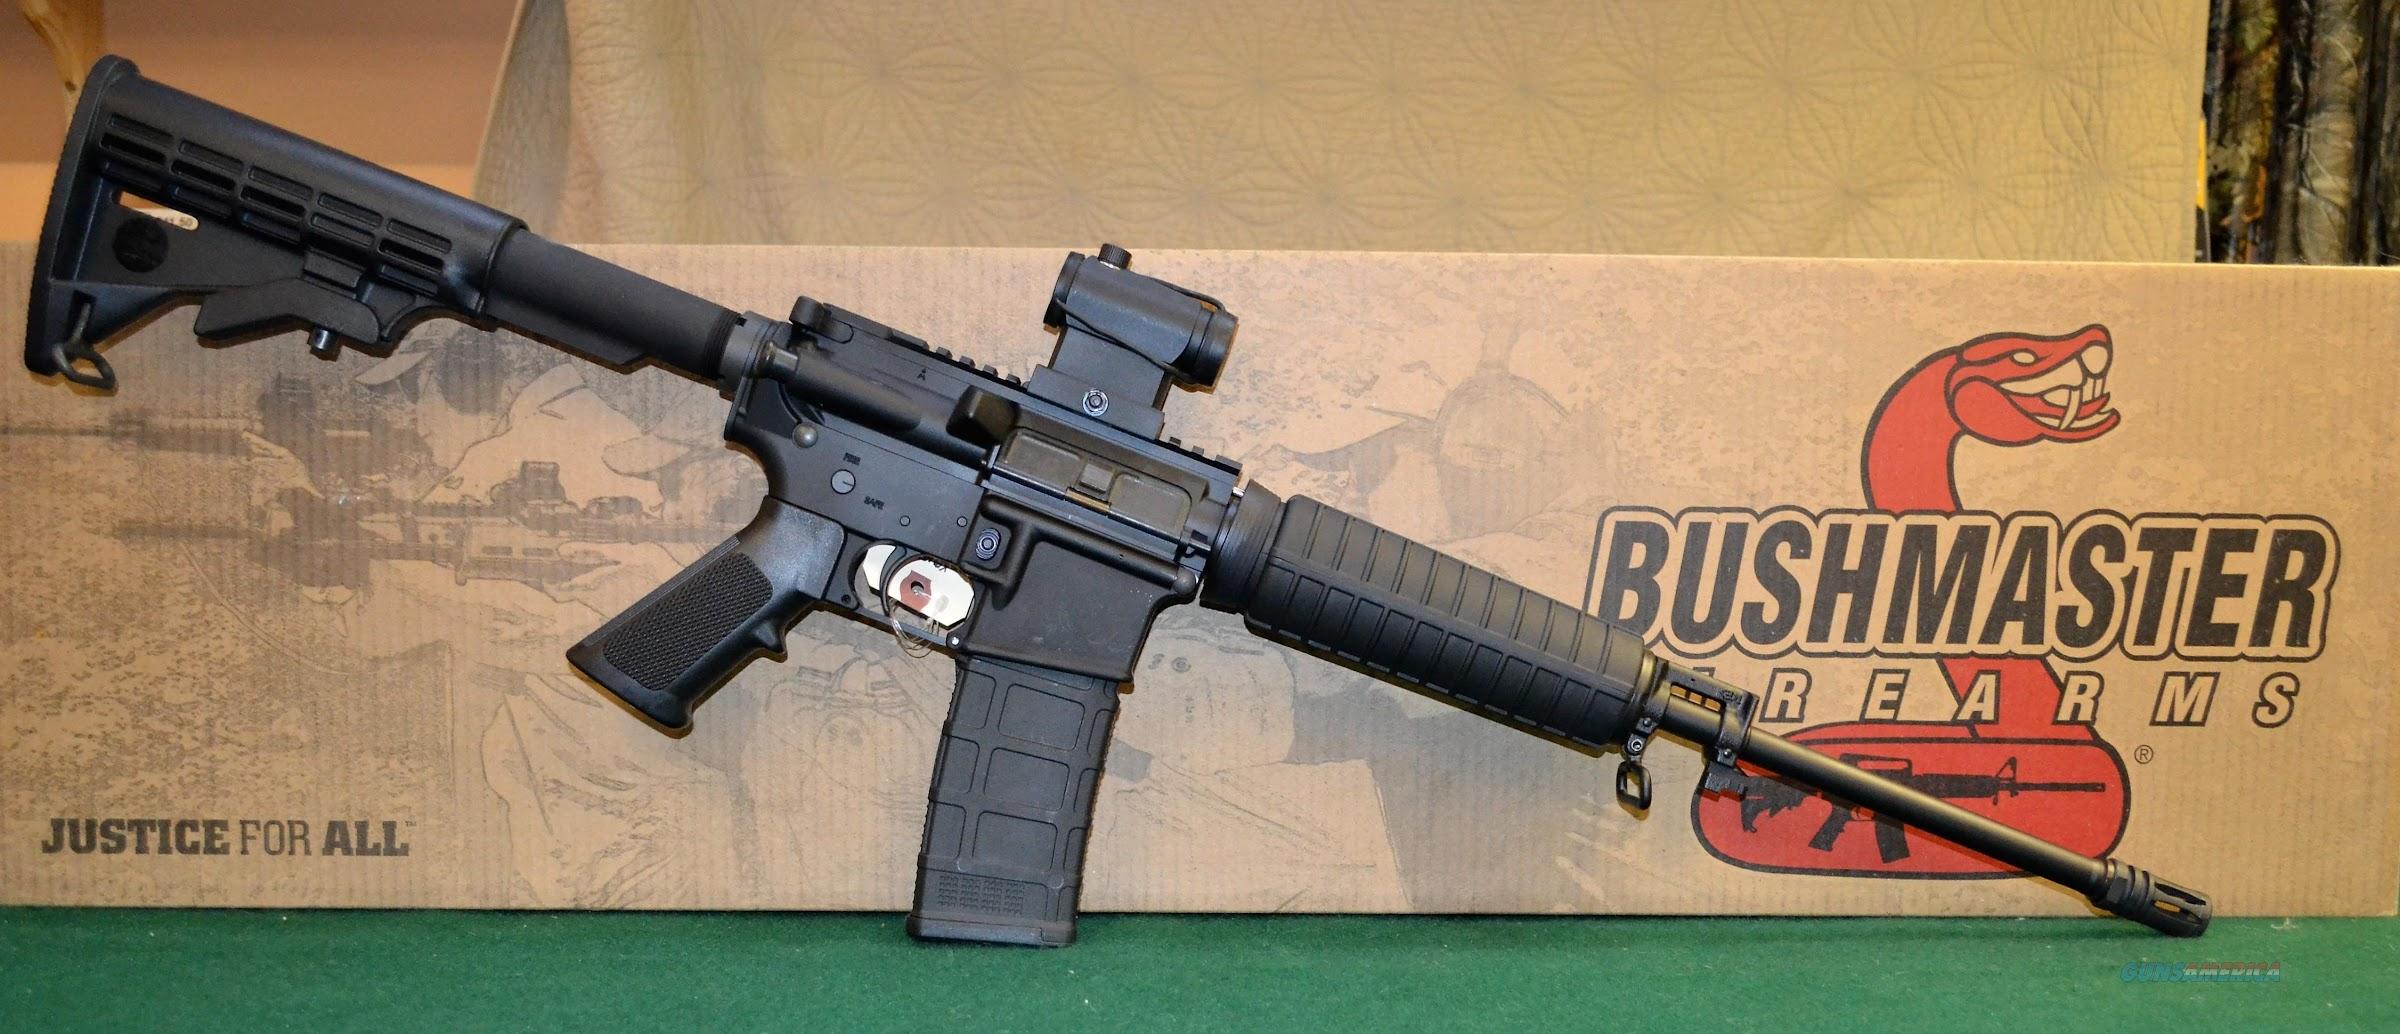 New Illinois gun law redefines semi-automatics as 'assault' rifles